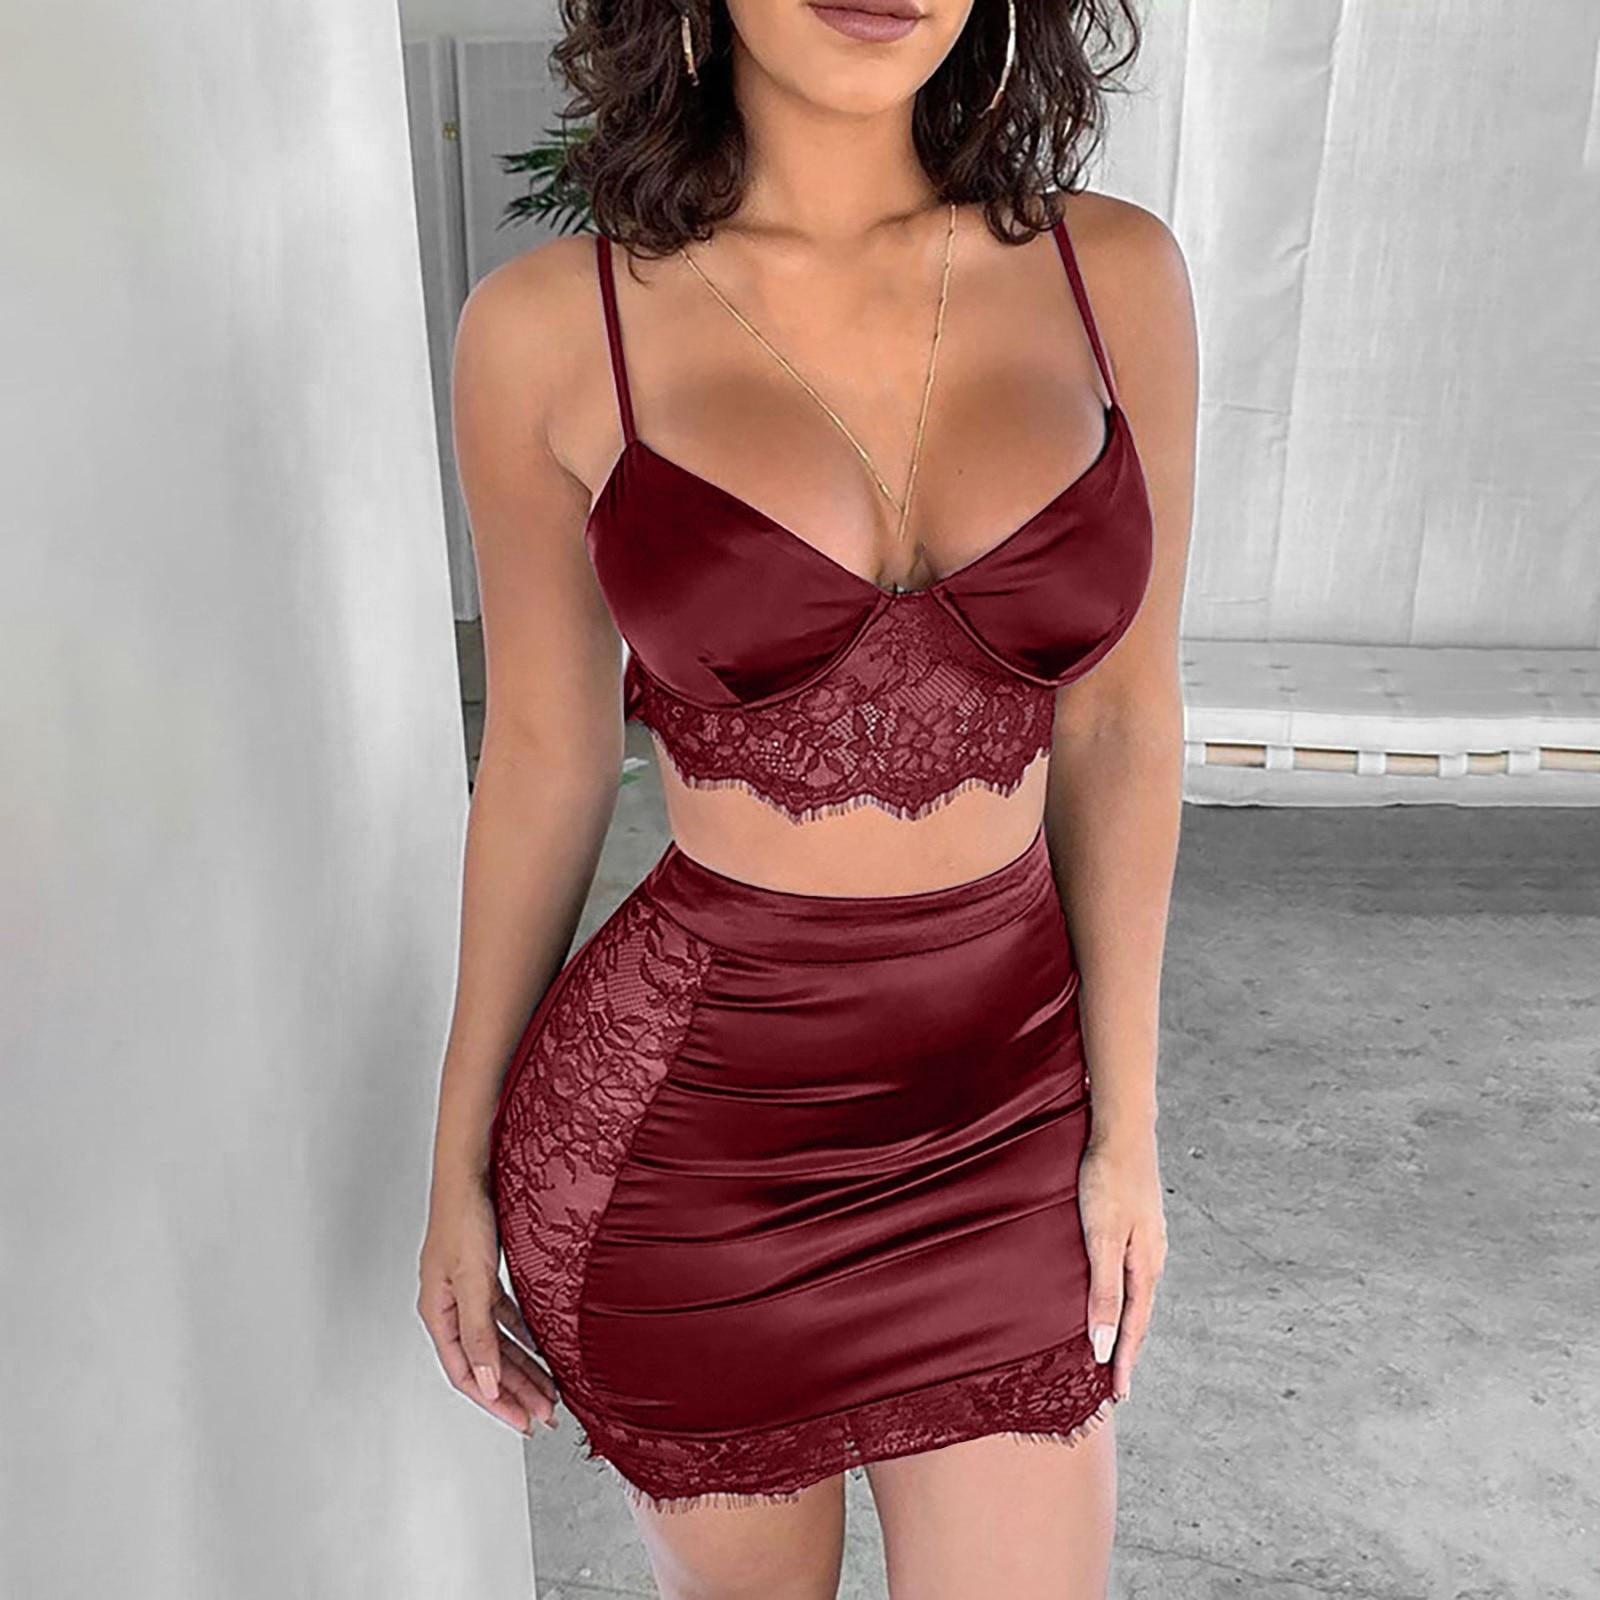 Sexy Solid Color Lace Stitching Fun Suit Skirt Lingerie Temptation Underwear Plus Size Back Pajamas